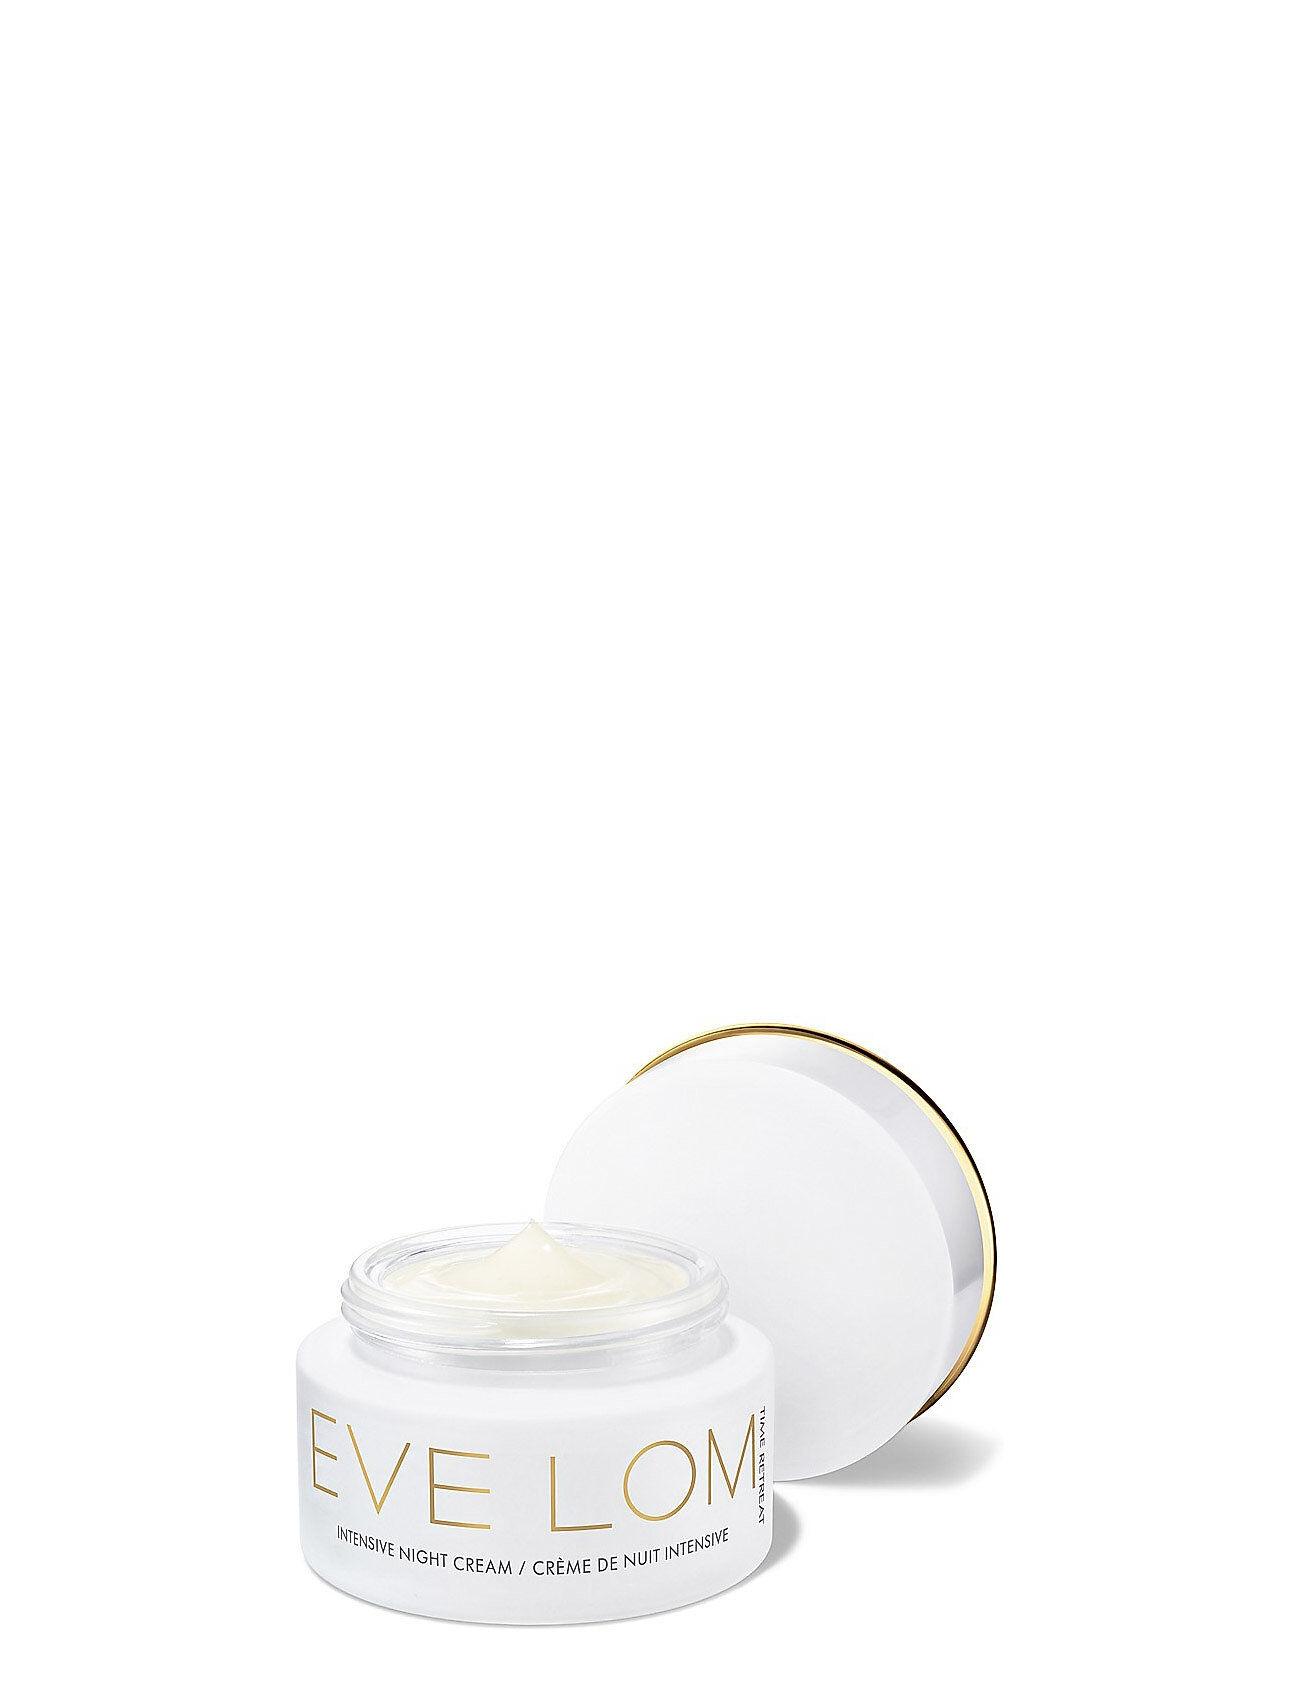 EVE LOM Time Retreat Intensive Night Cream Beauty WOMEN Skin Care Face Day Creams Nude